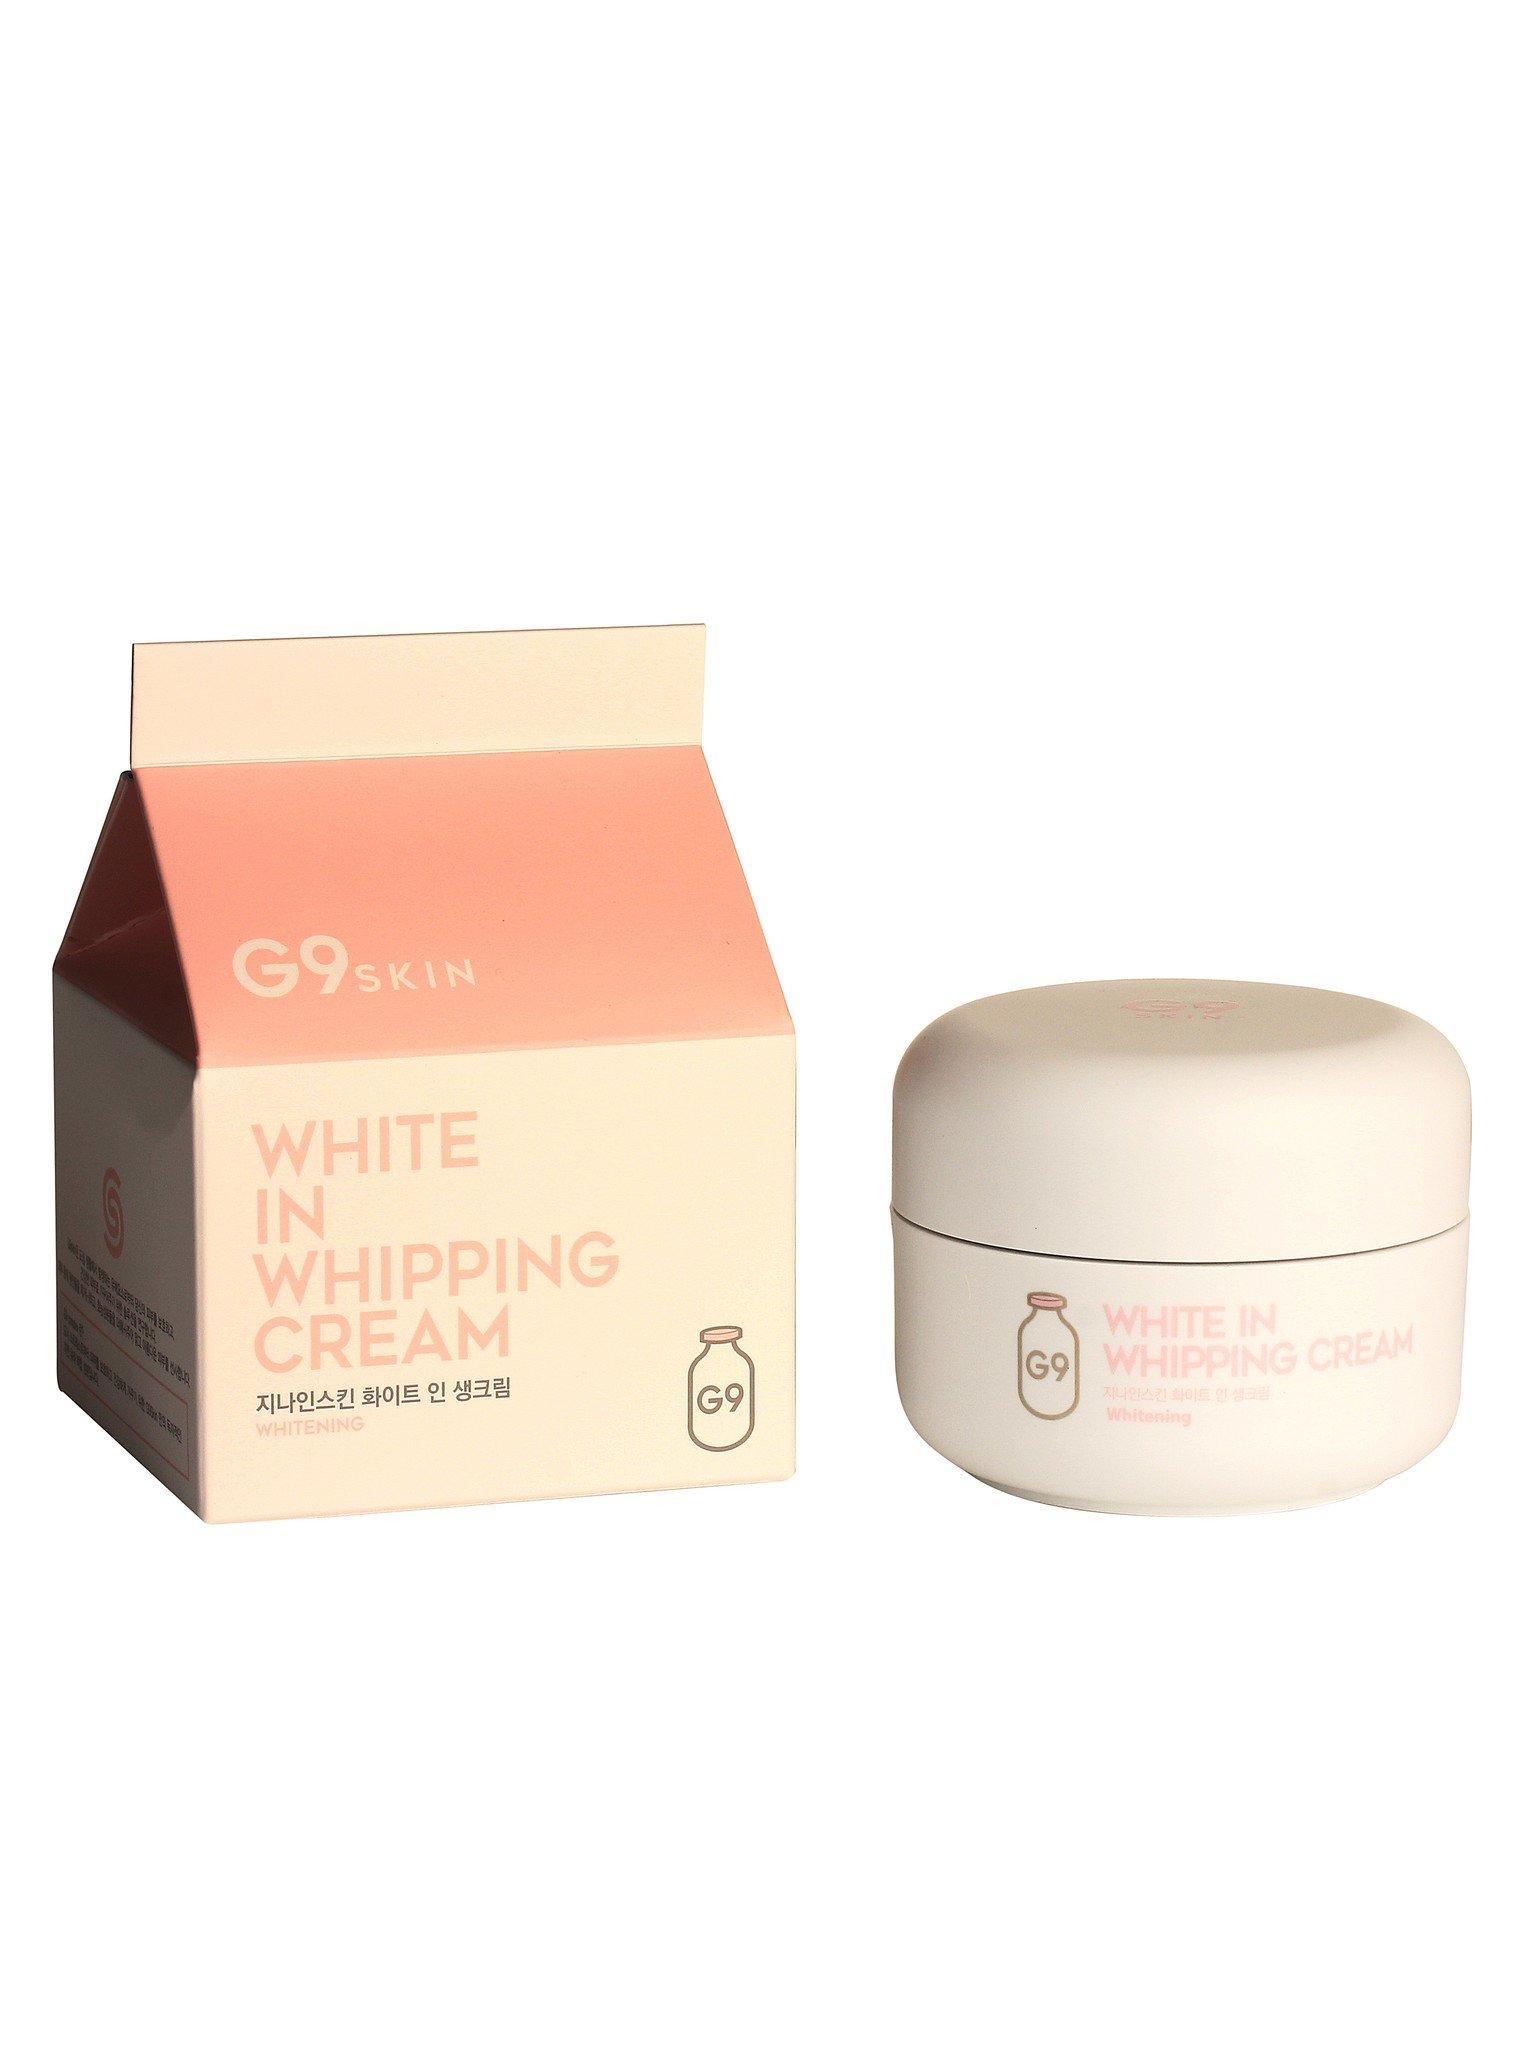 Berrisom 22 Collagen Intensive Firming Cream 50gr G9 White In Whipping 50